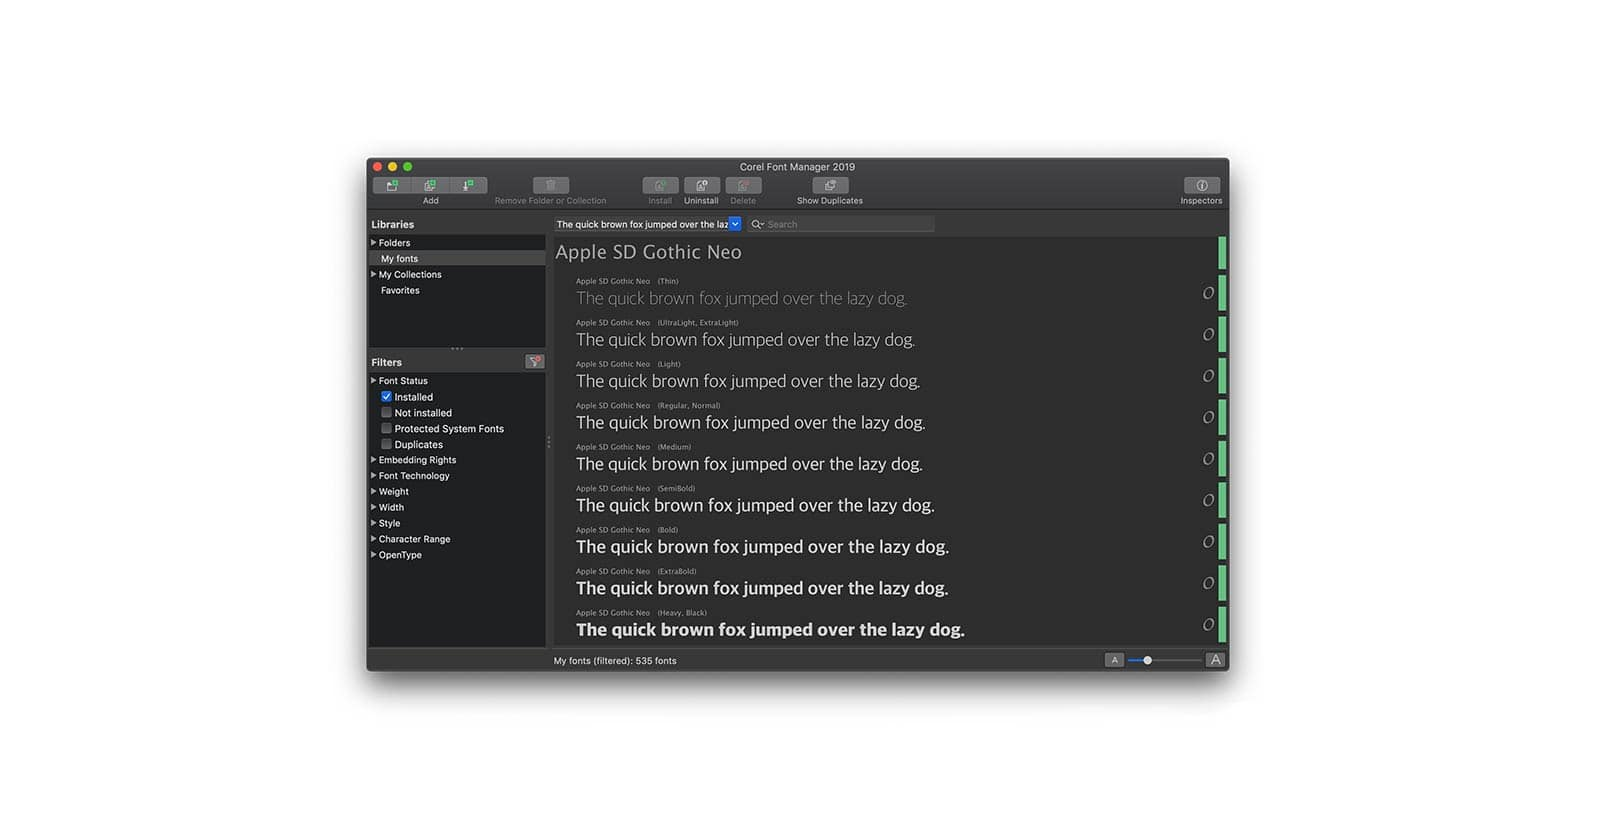 Graphic Design Software – Mac – CorelDRAW Graphics Suite 2019